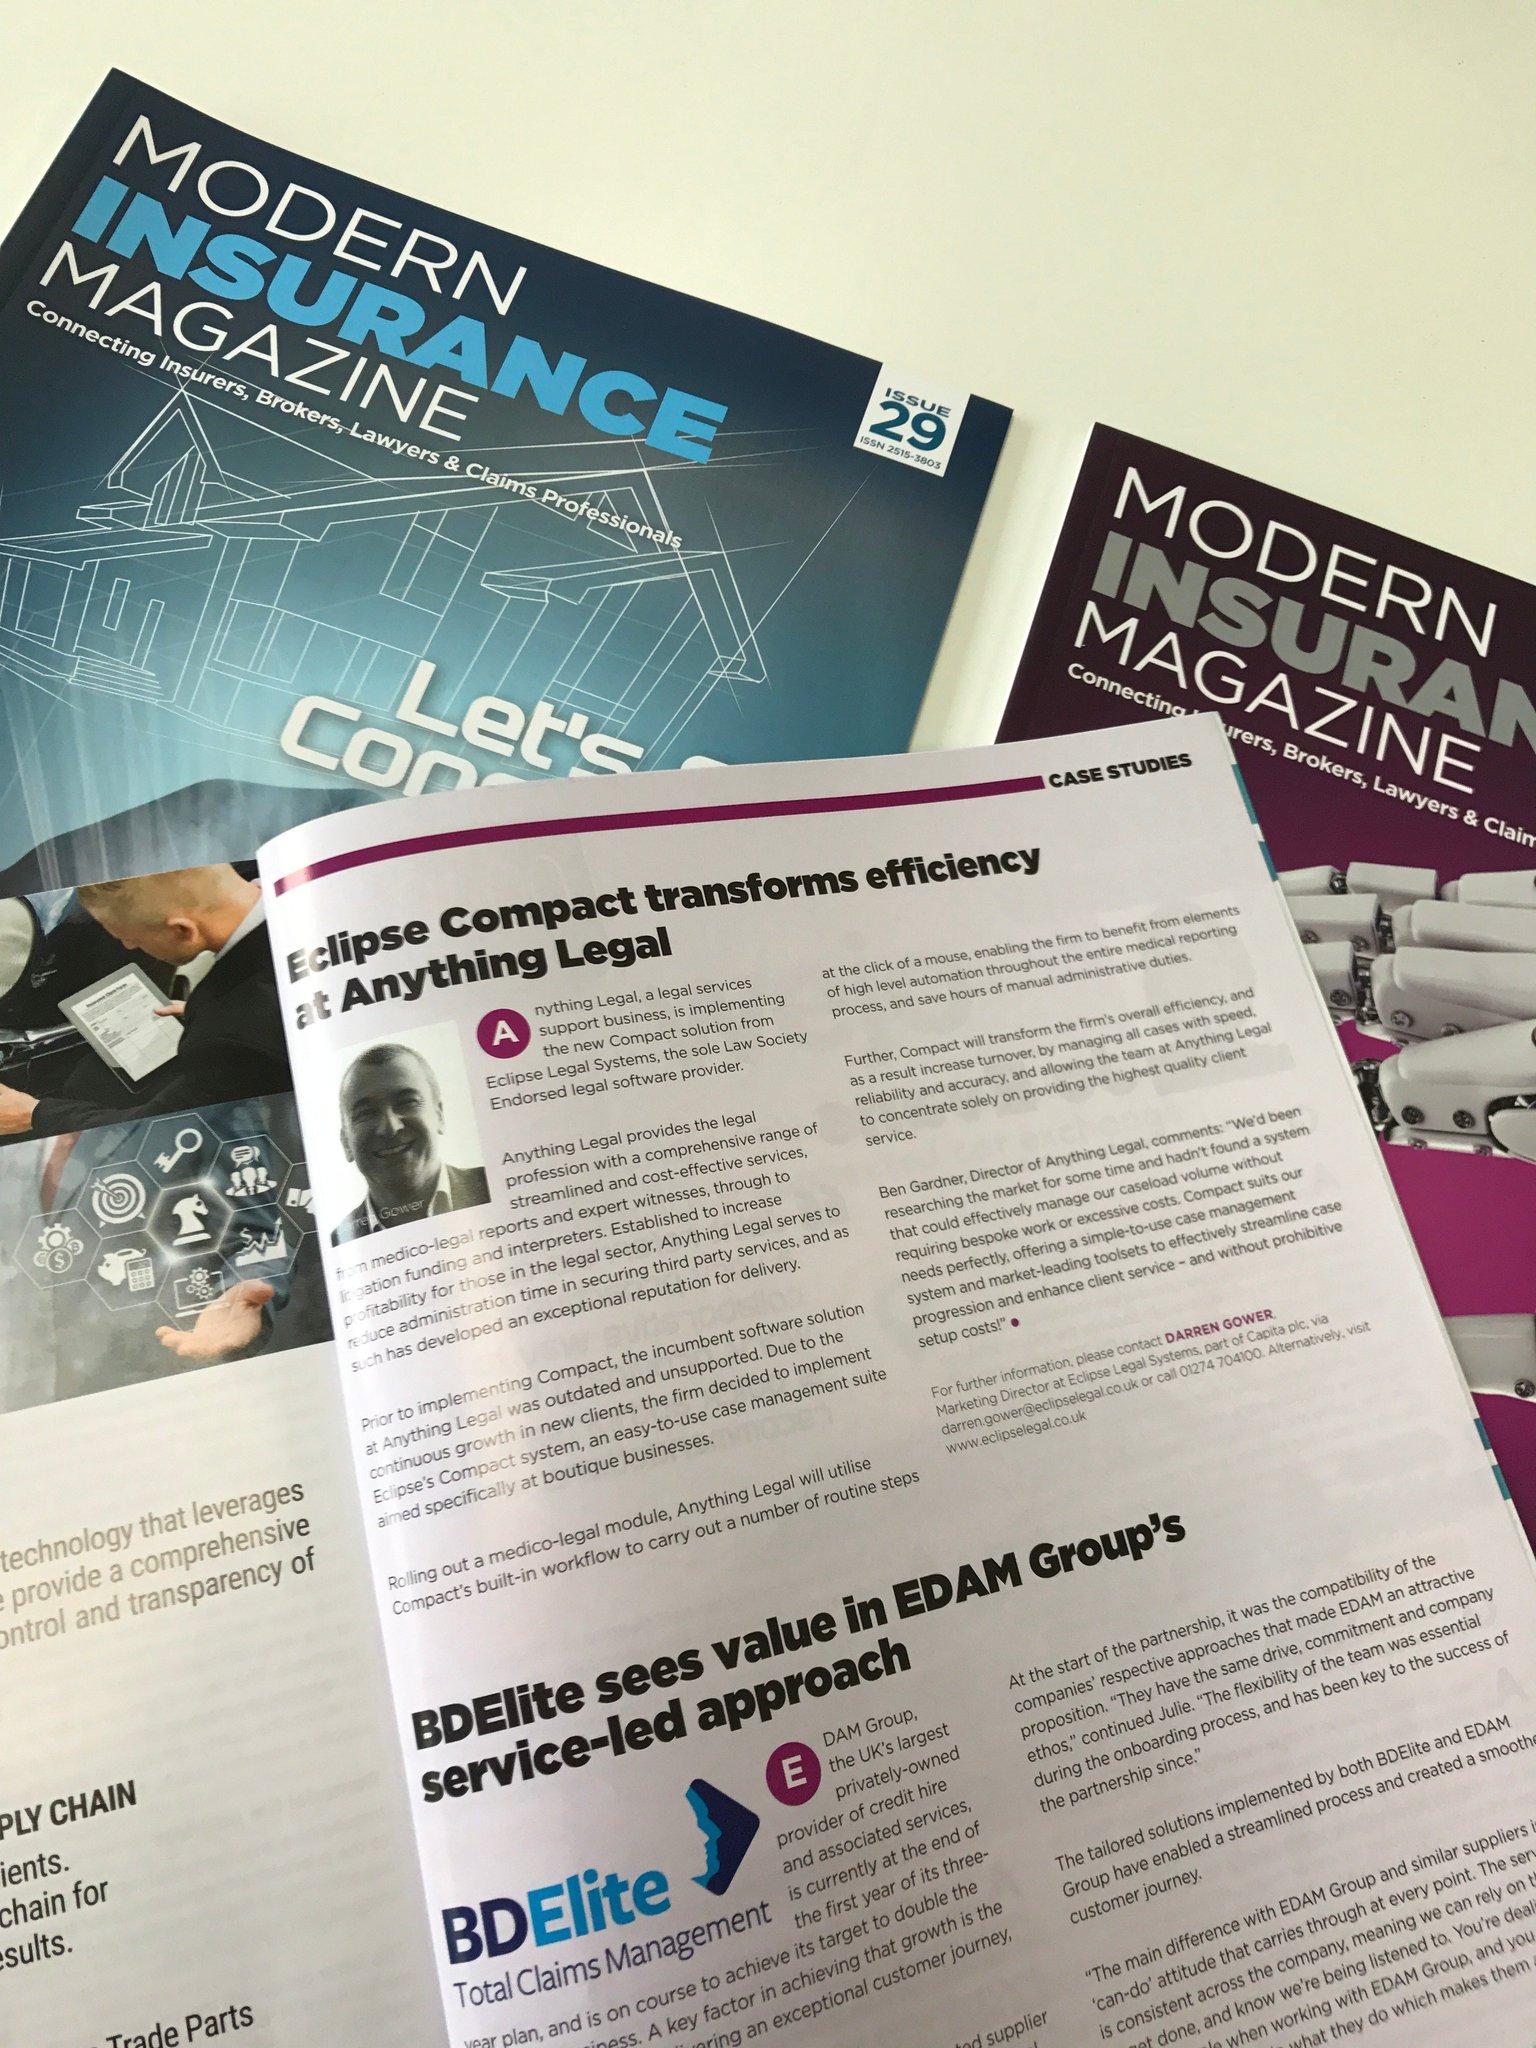 Modern Insurance Magazine on Twitter: